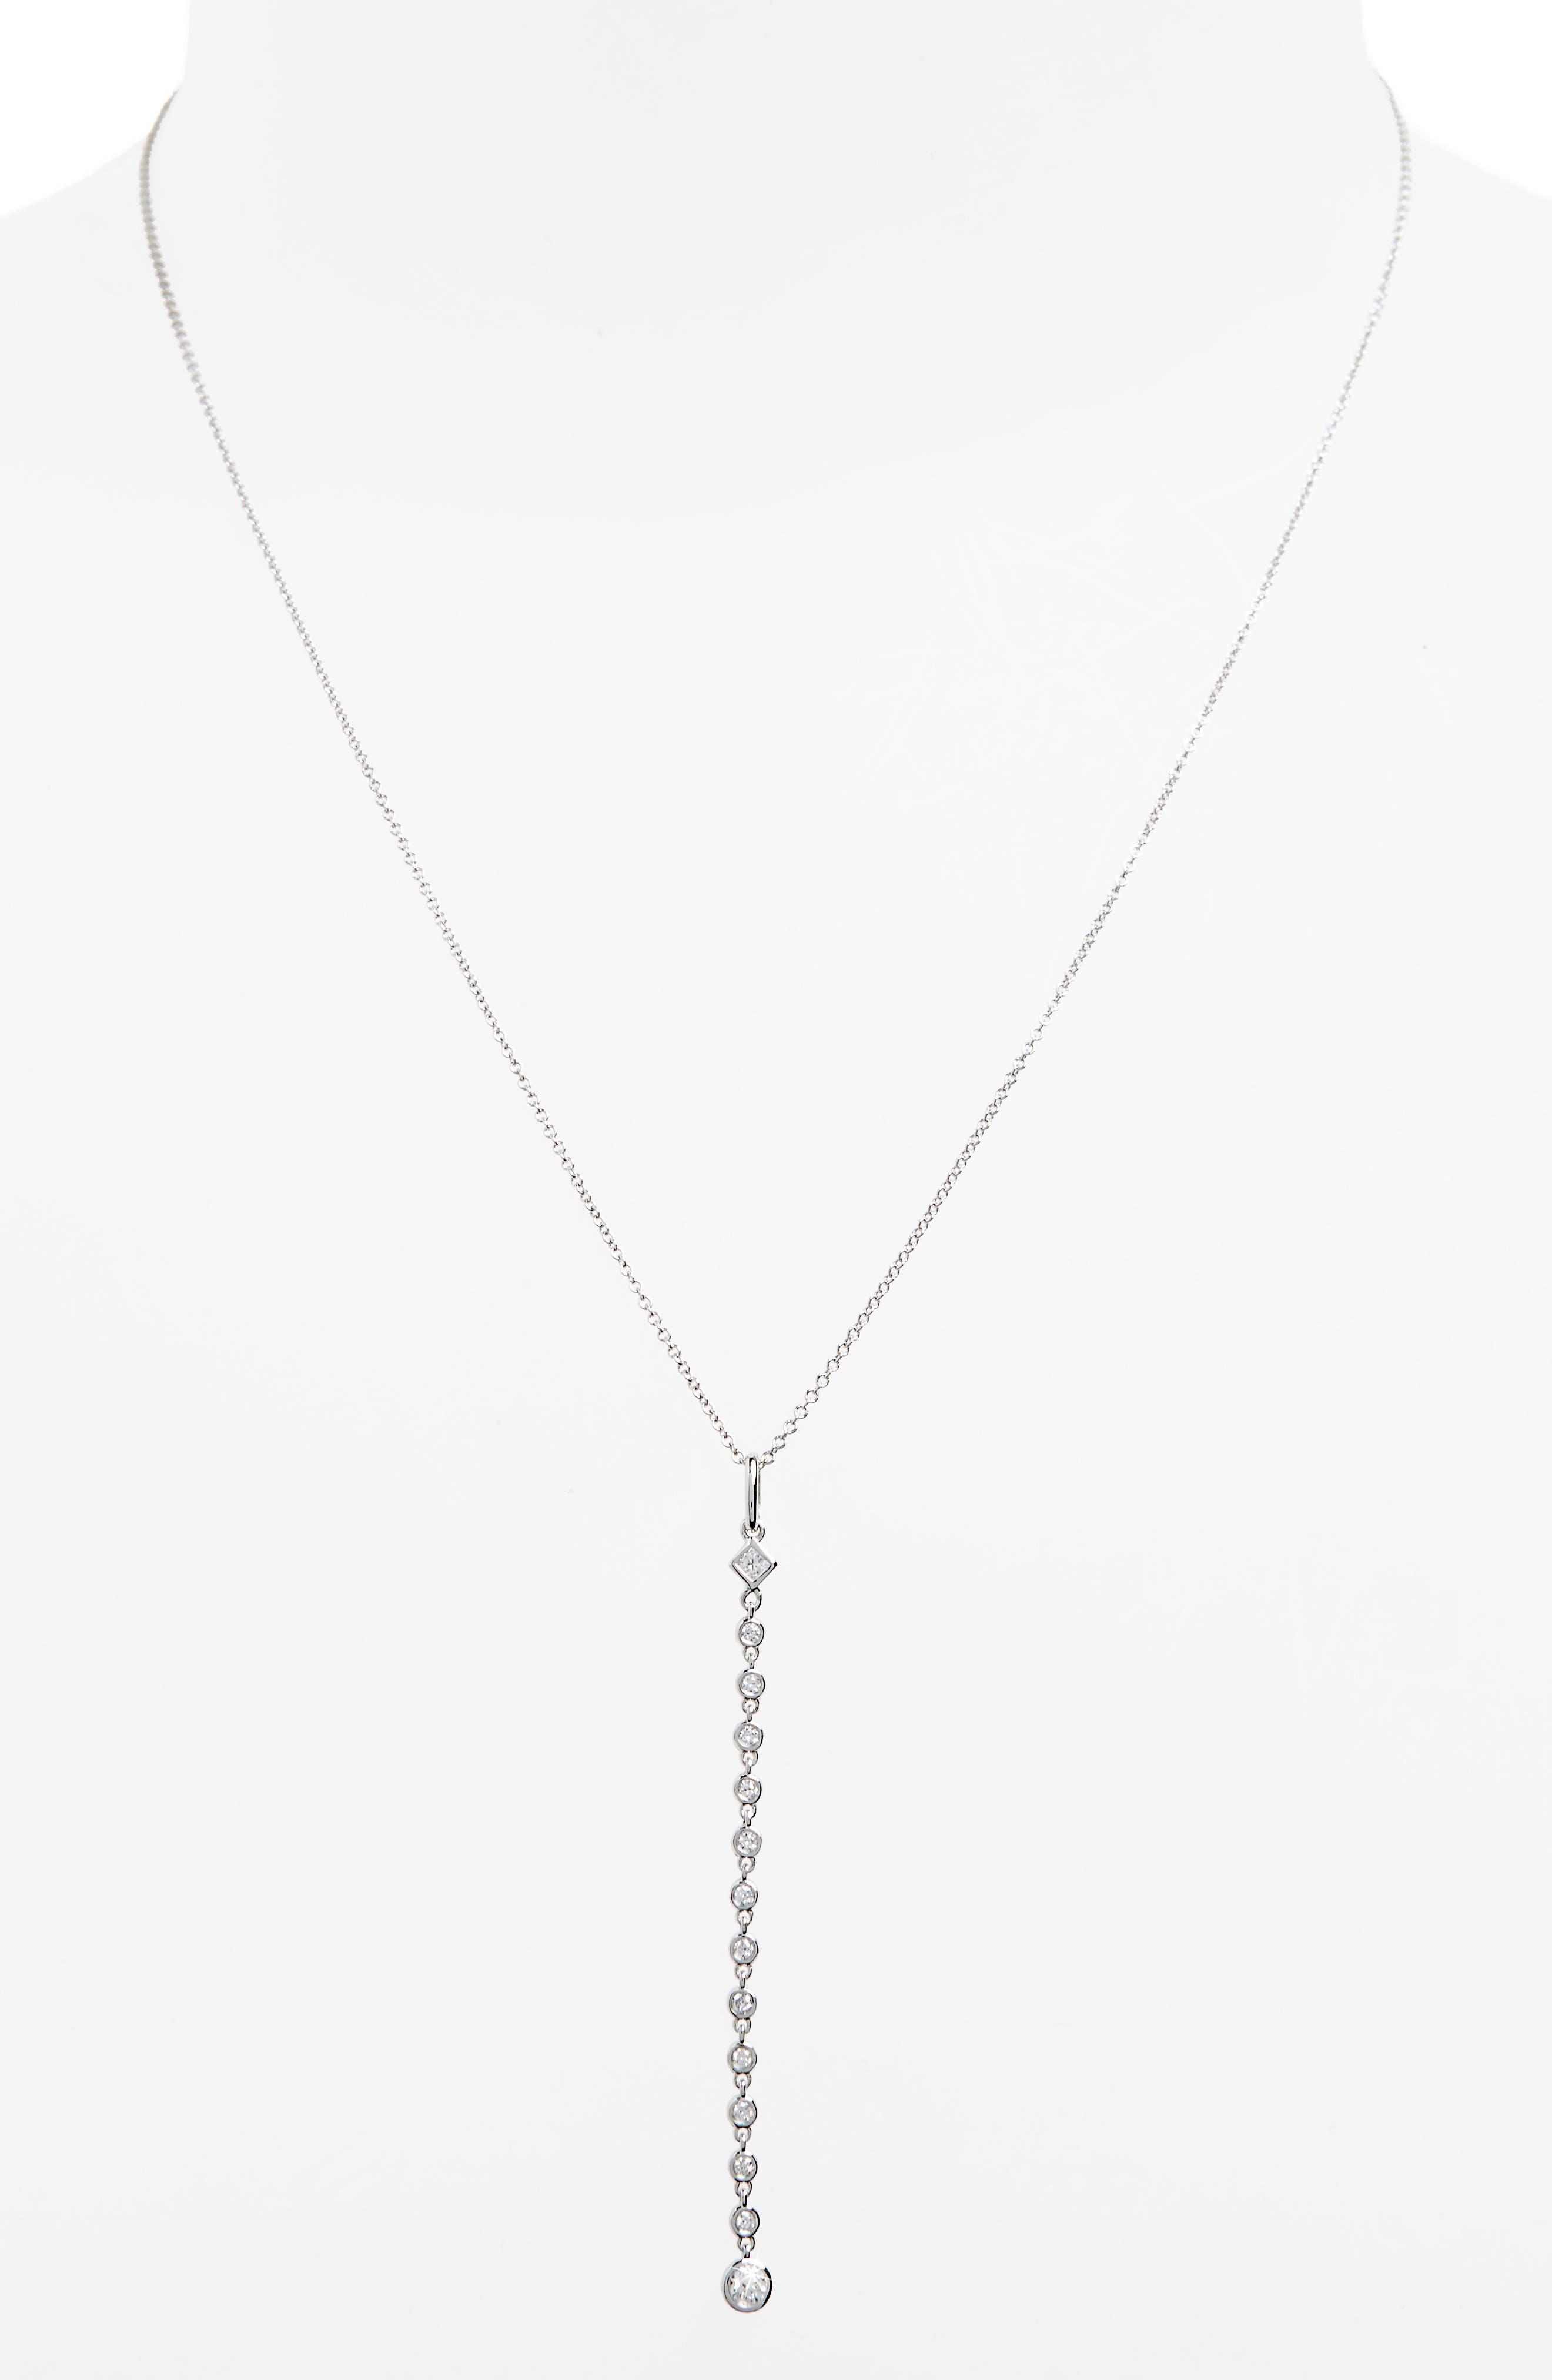 Alternate Image 1 Selected - Bony Levy Liora Diamond Y-Necklace (Nordstrom Exclusive)